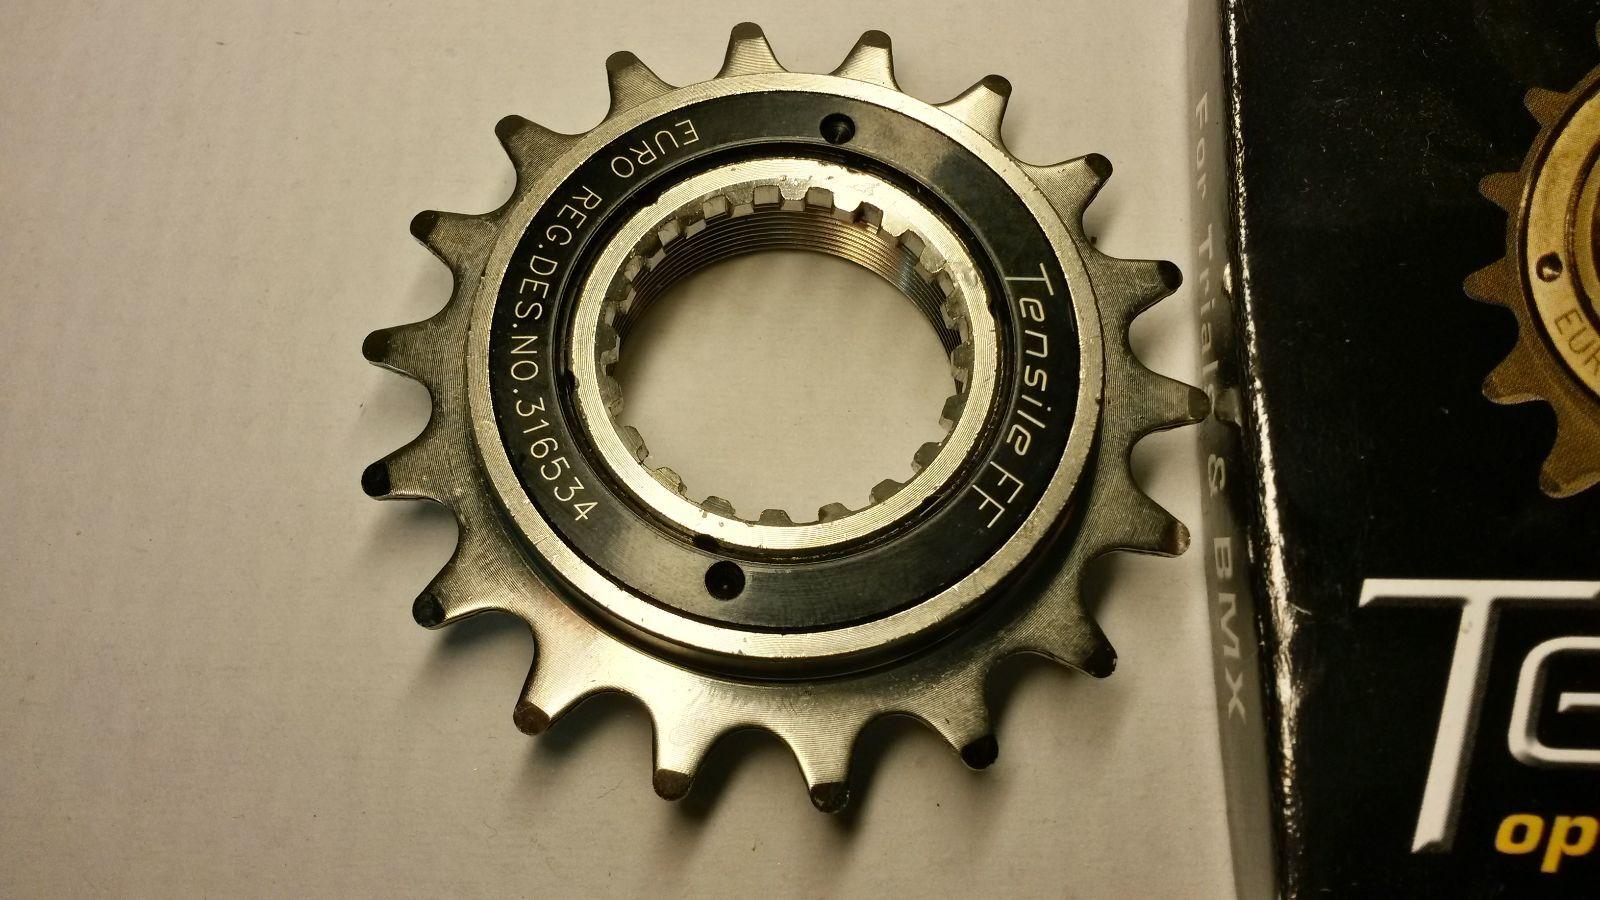 Freewheel tensile 18t trials bmx bike trial